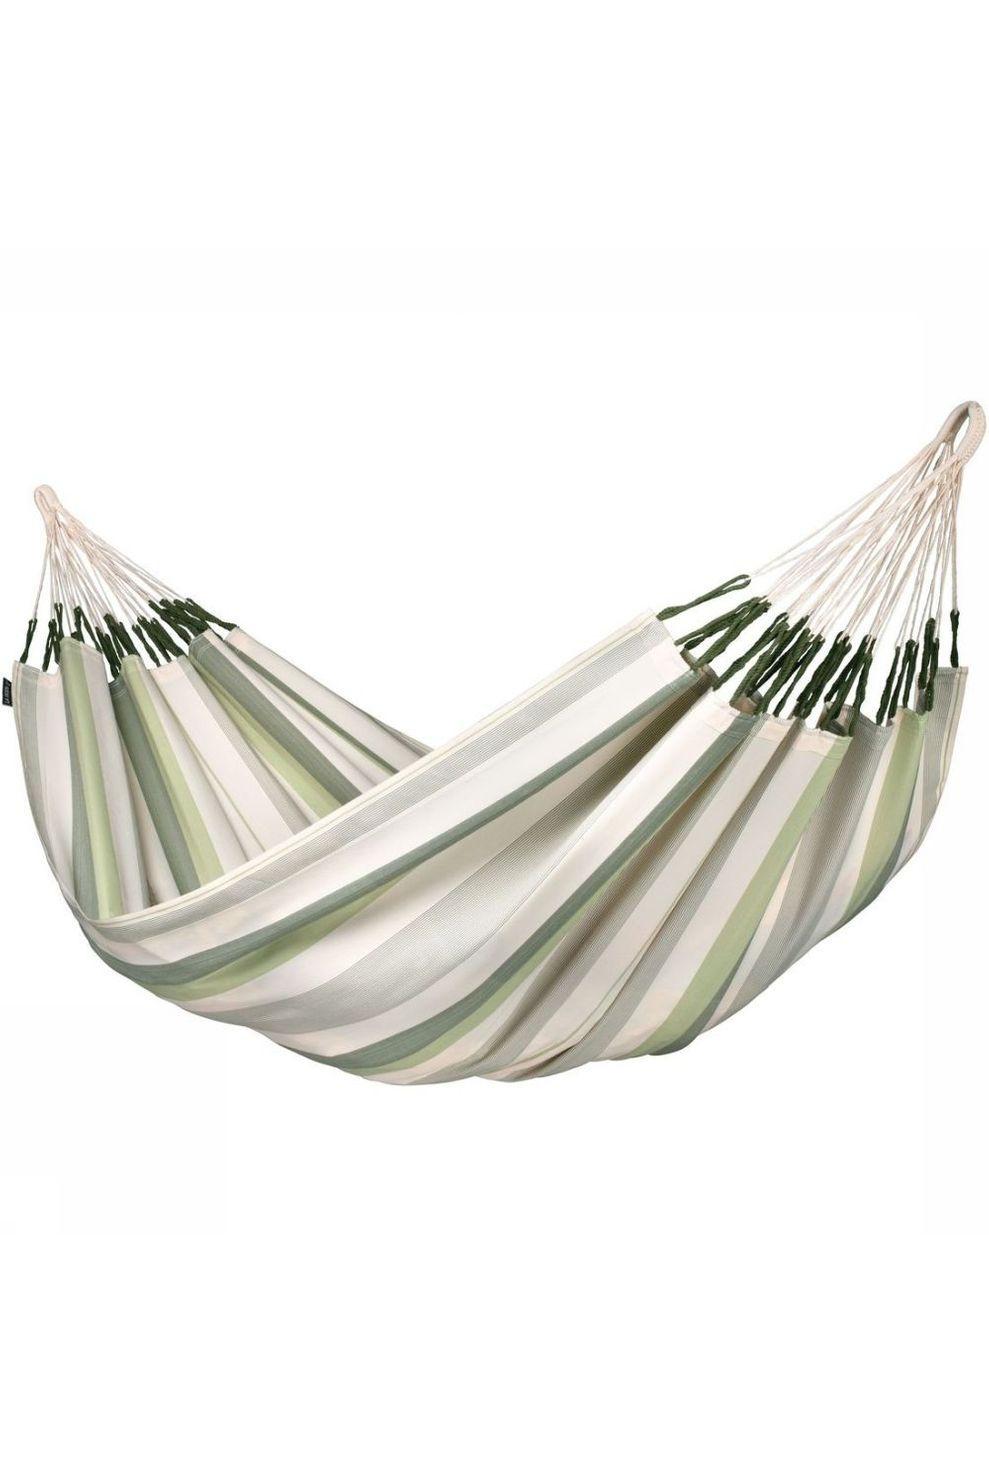 La Siesta Hangmat Brisa Double - Groen/Wit